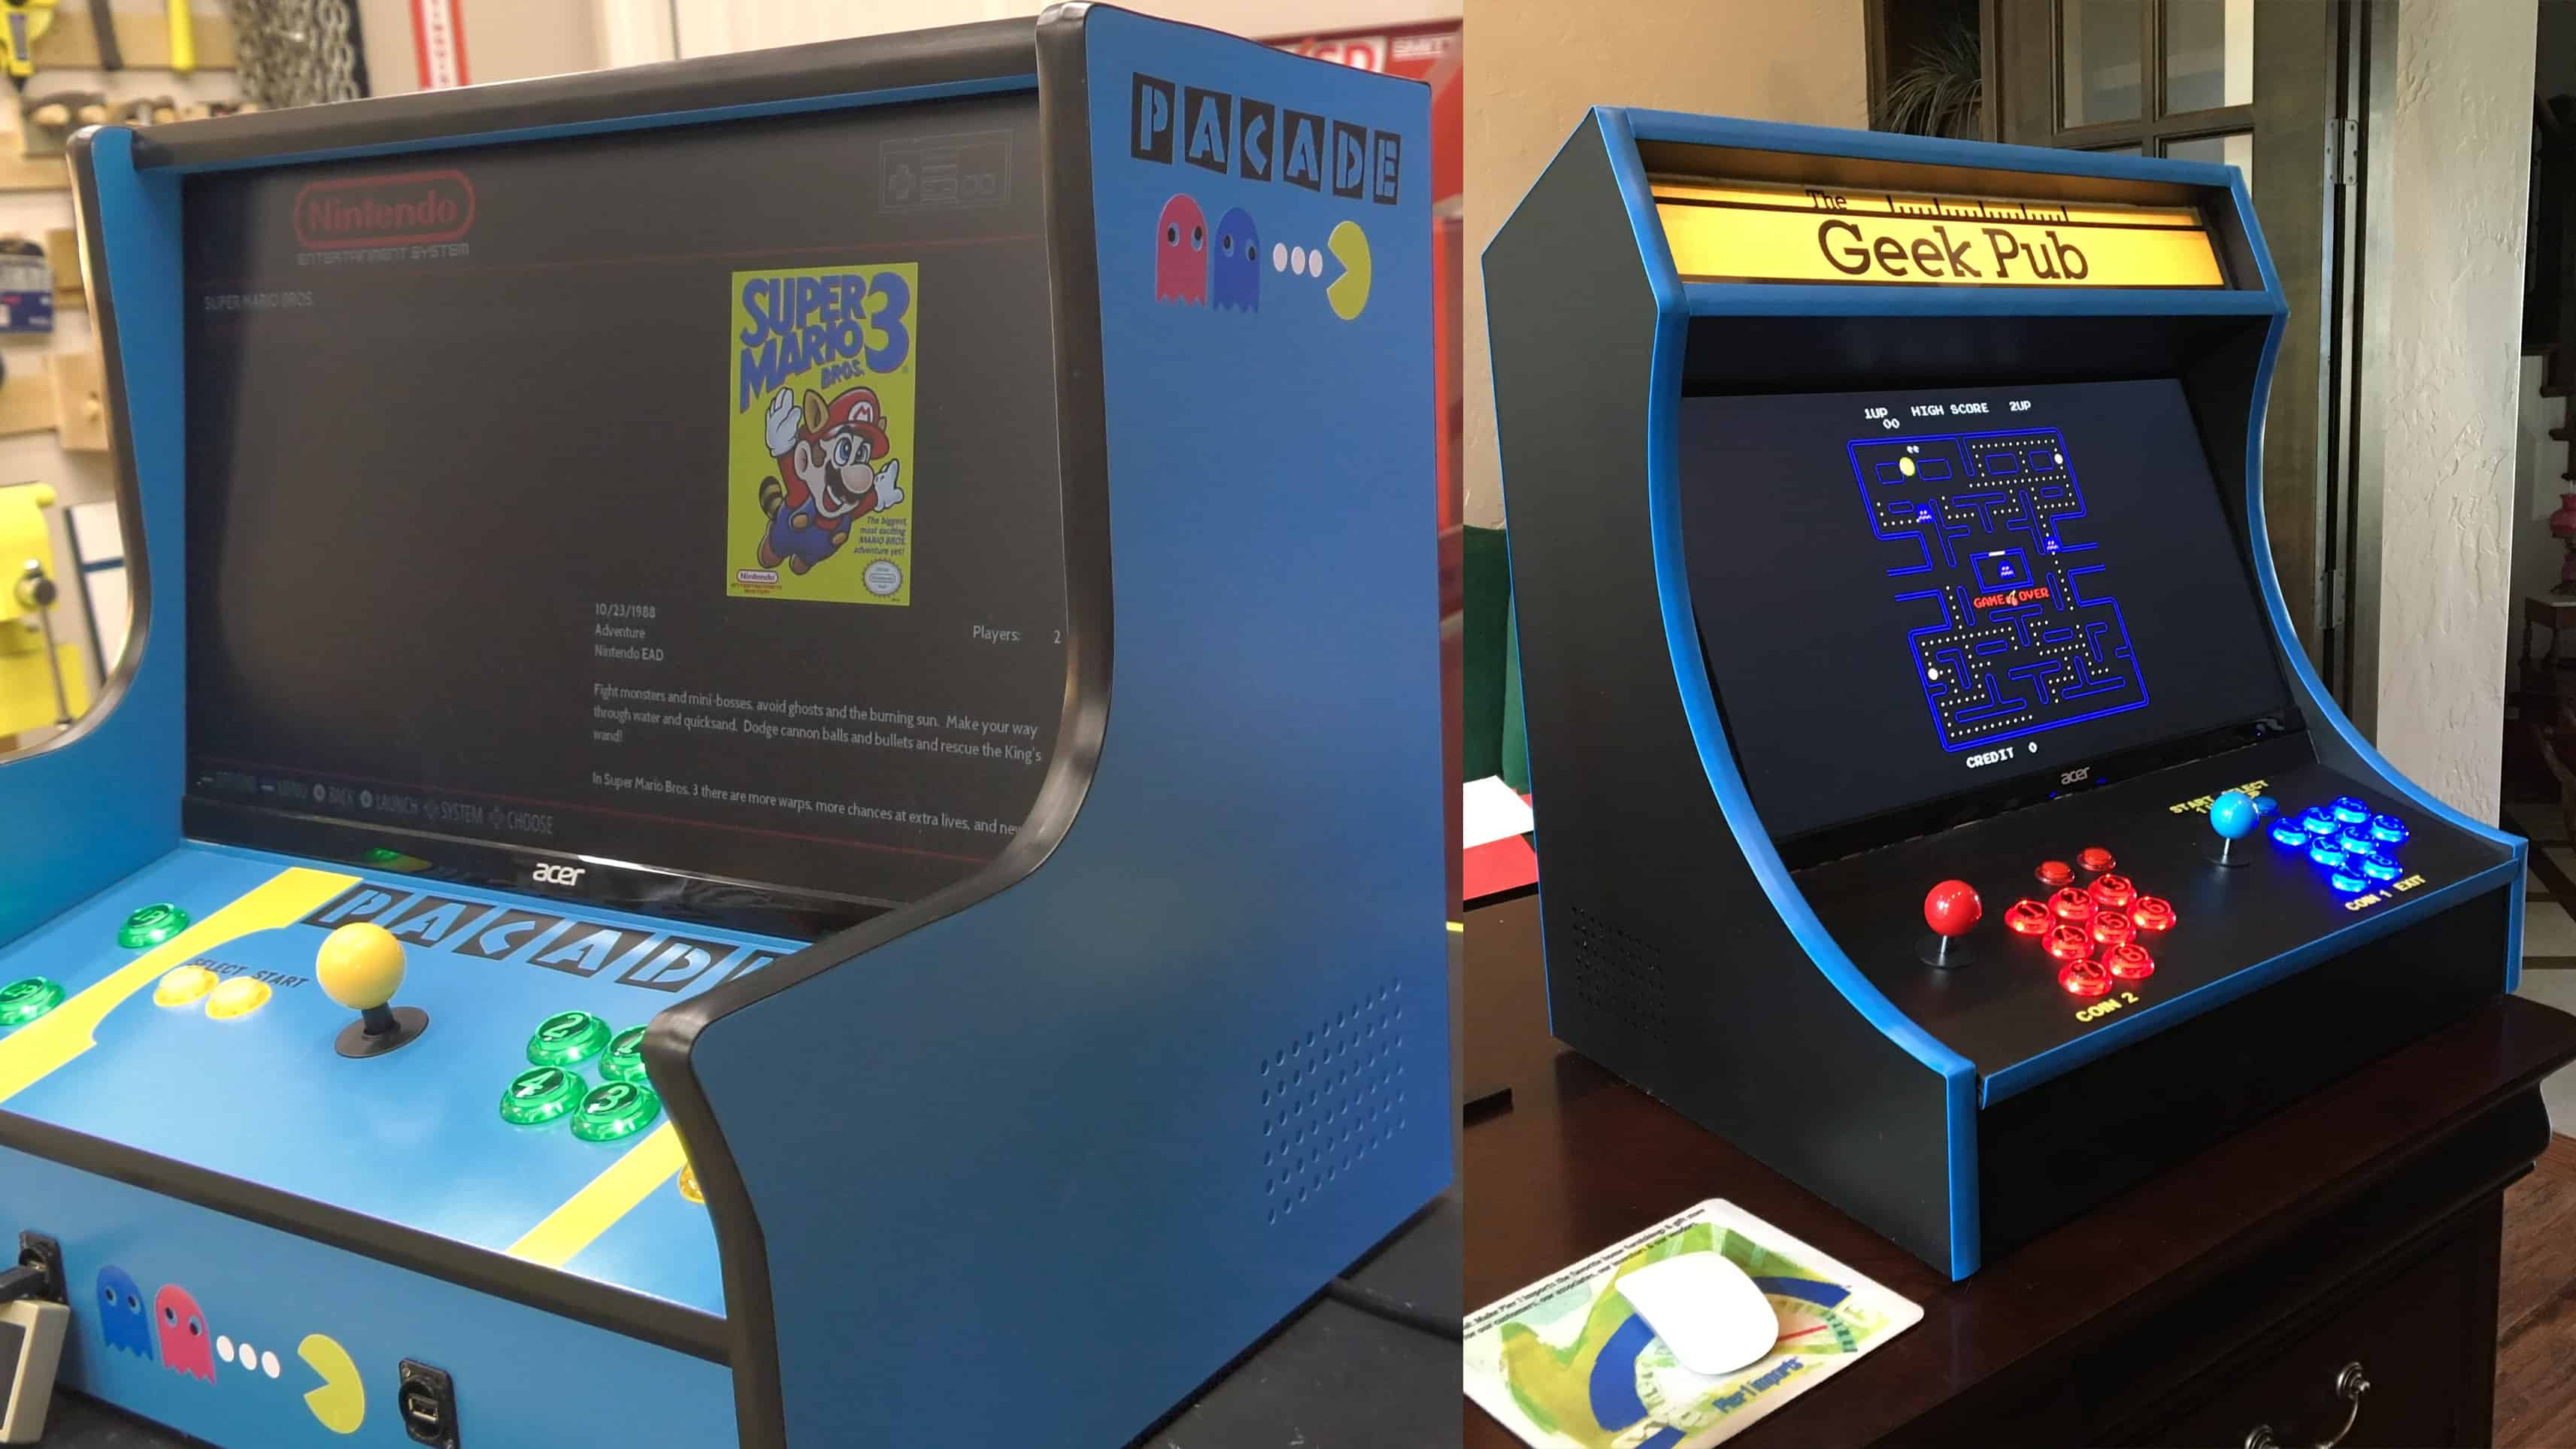 Bartop Arcade Two Plan Bundle - The Geek Pub